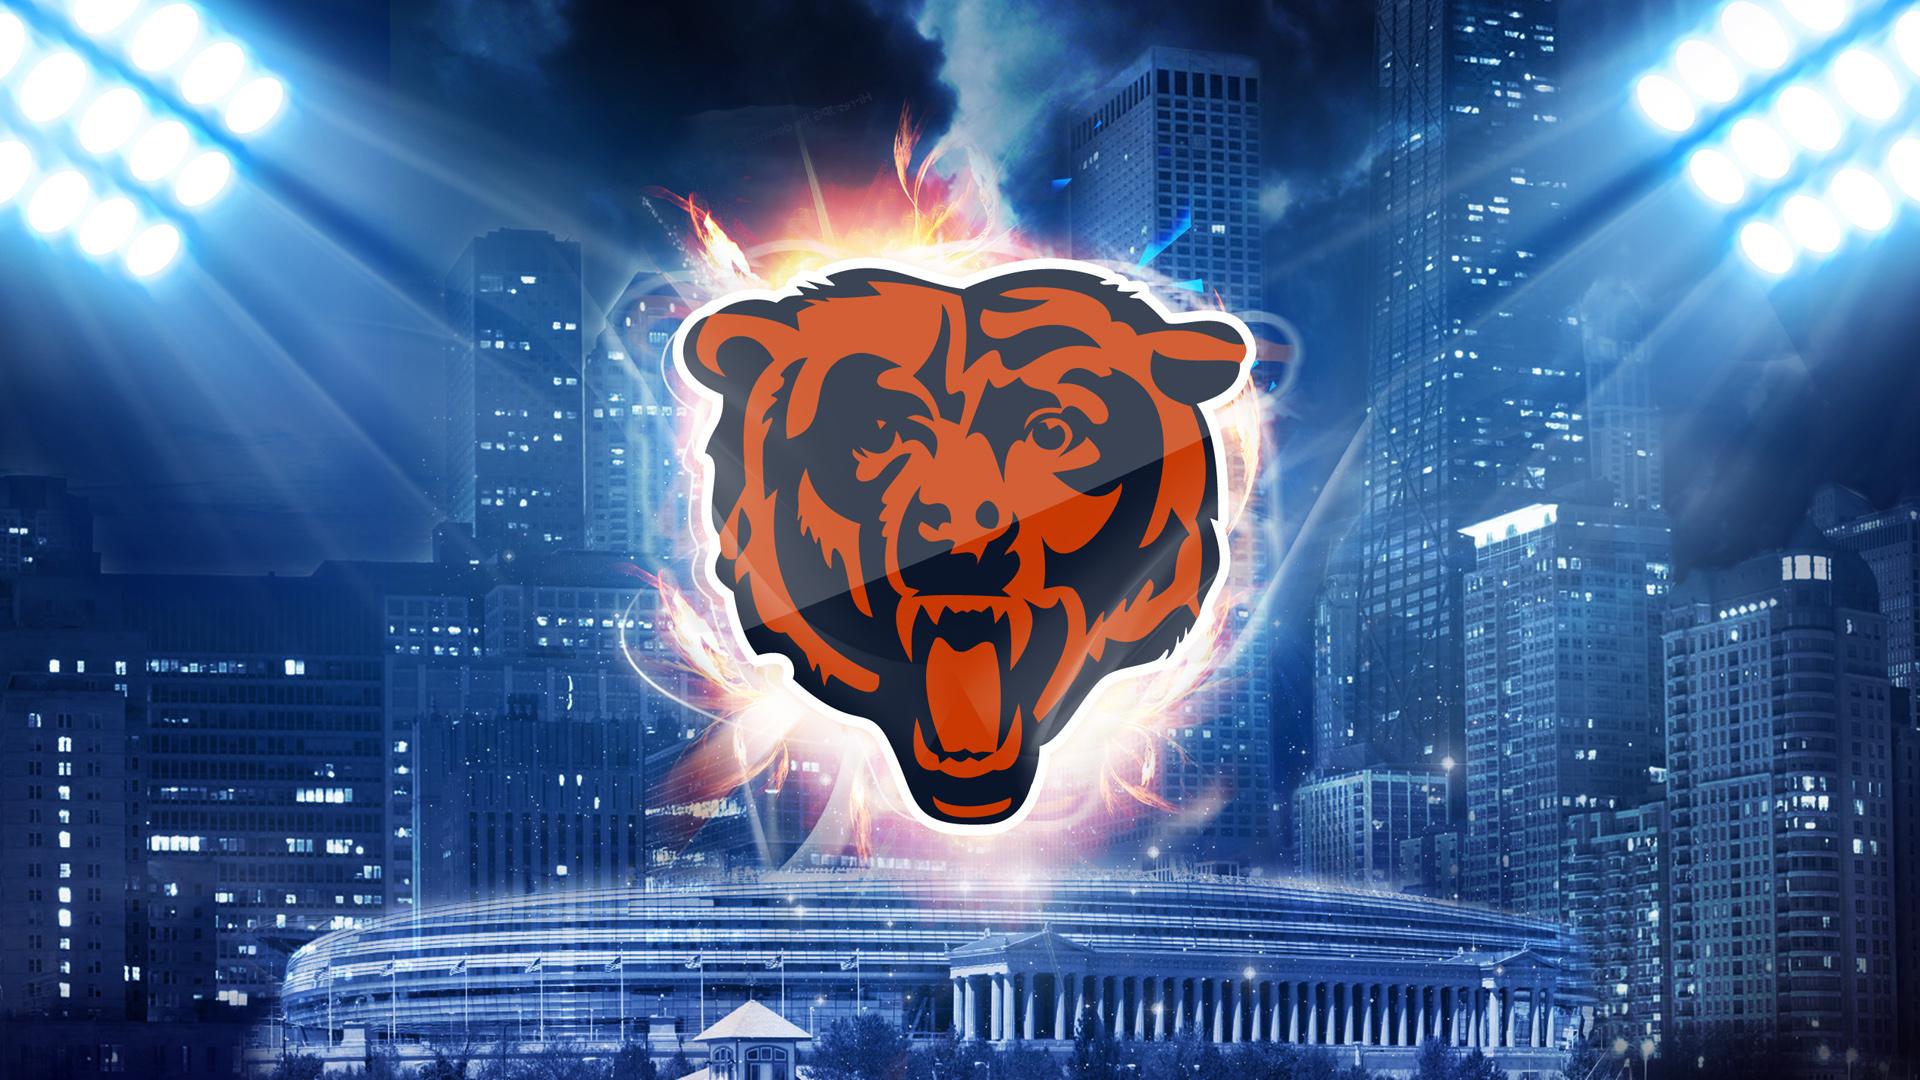 Chicago Bears Desktop Wallpaper 52903 1920x1080px 1920x1080